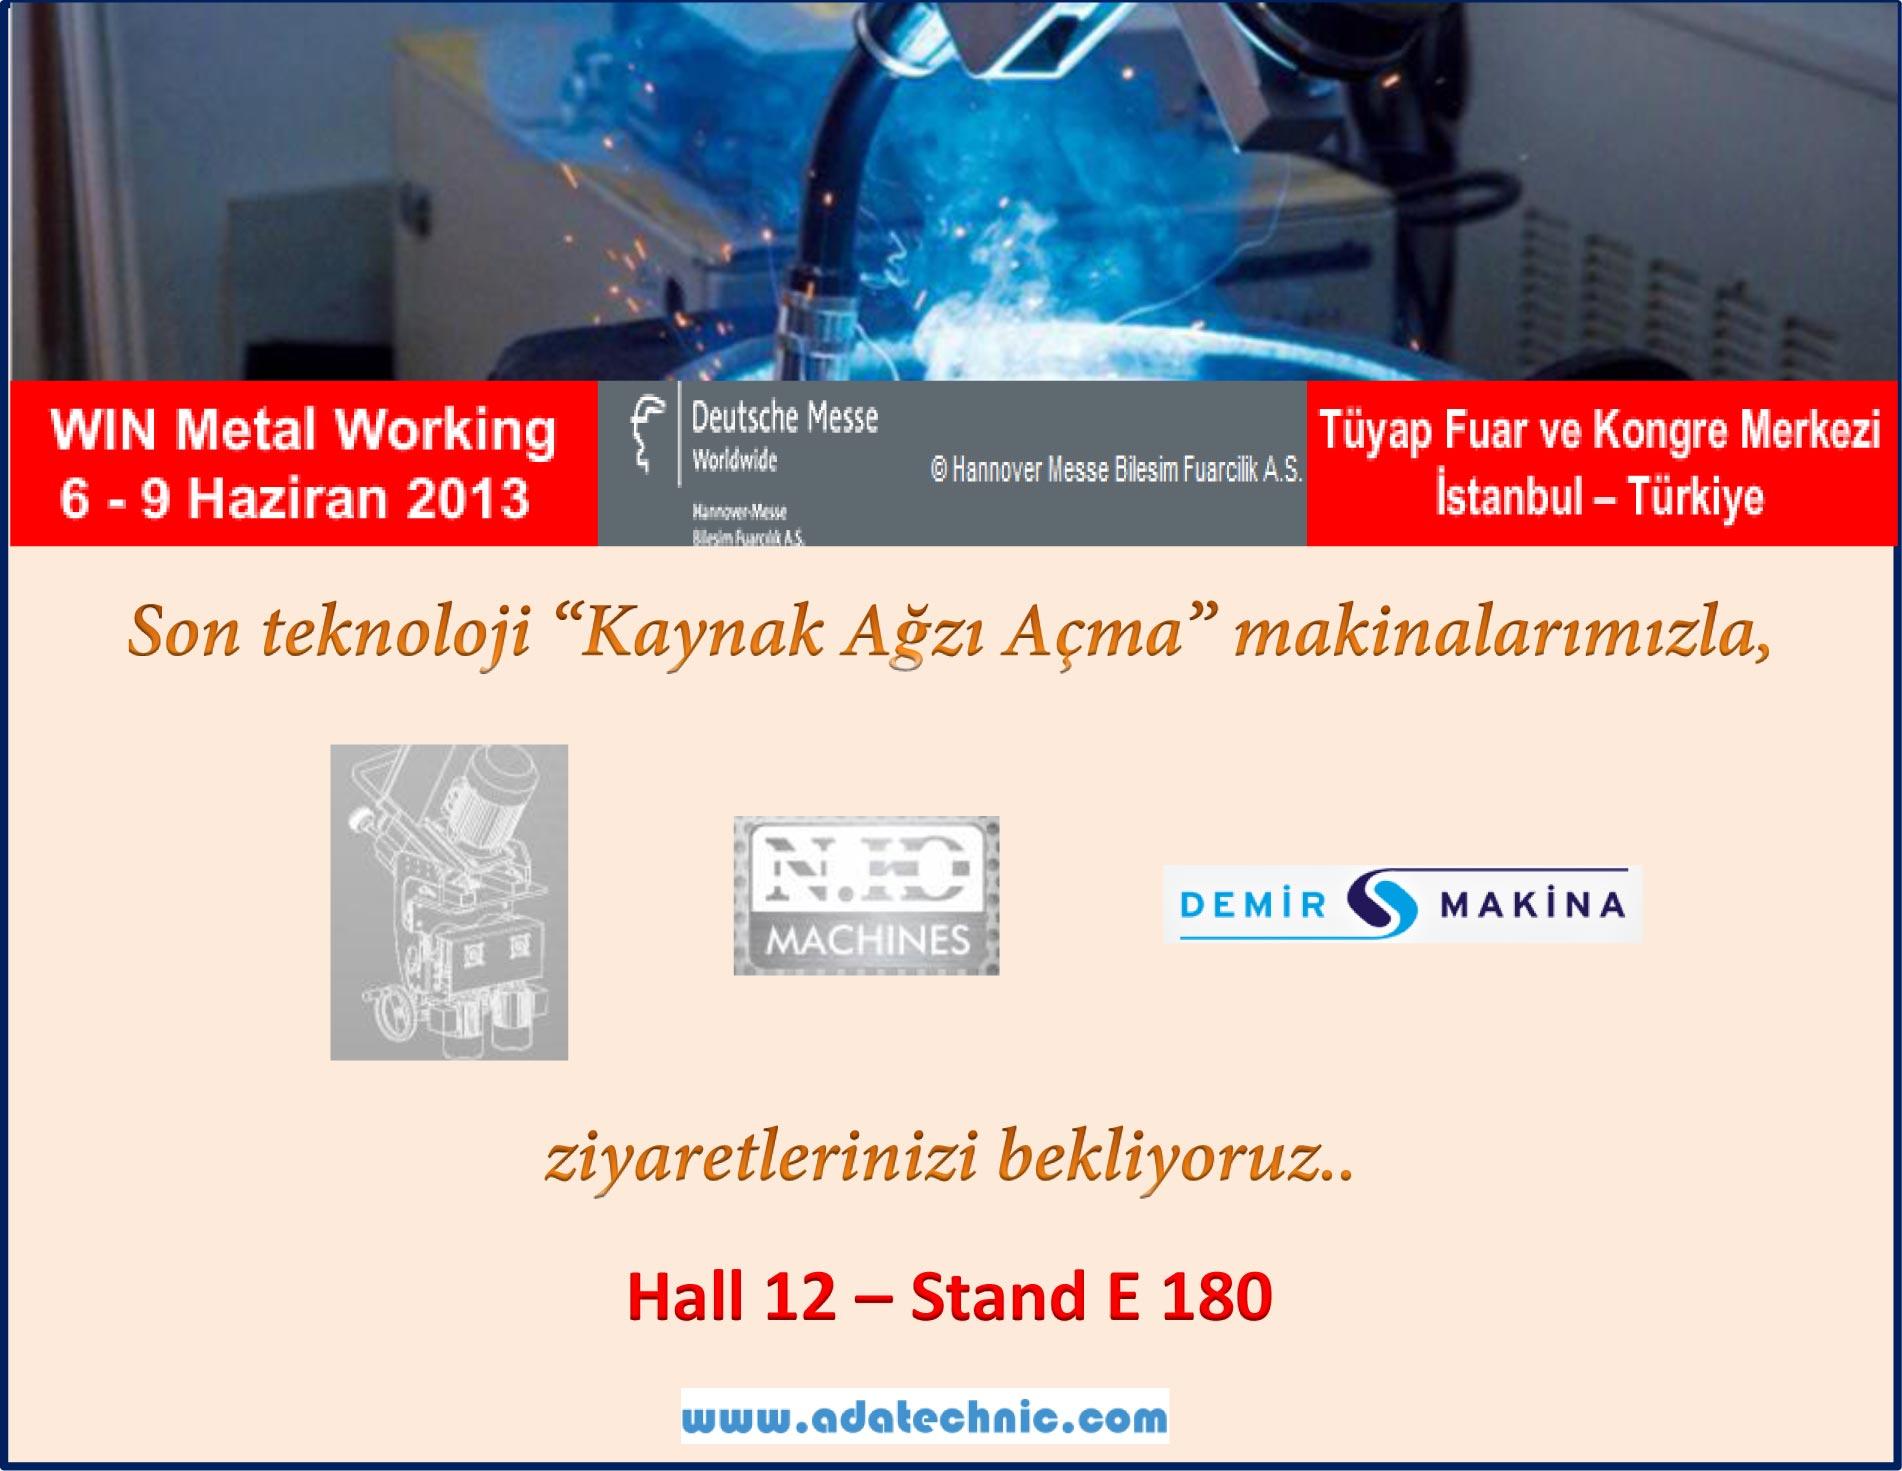 WIN Metal Working Fair Istanbul